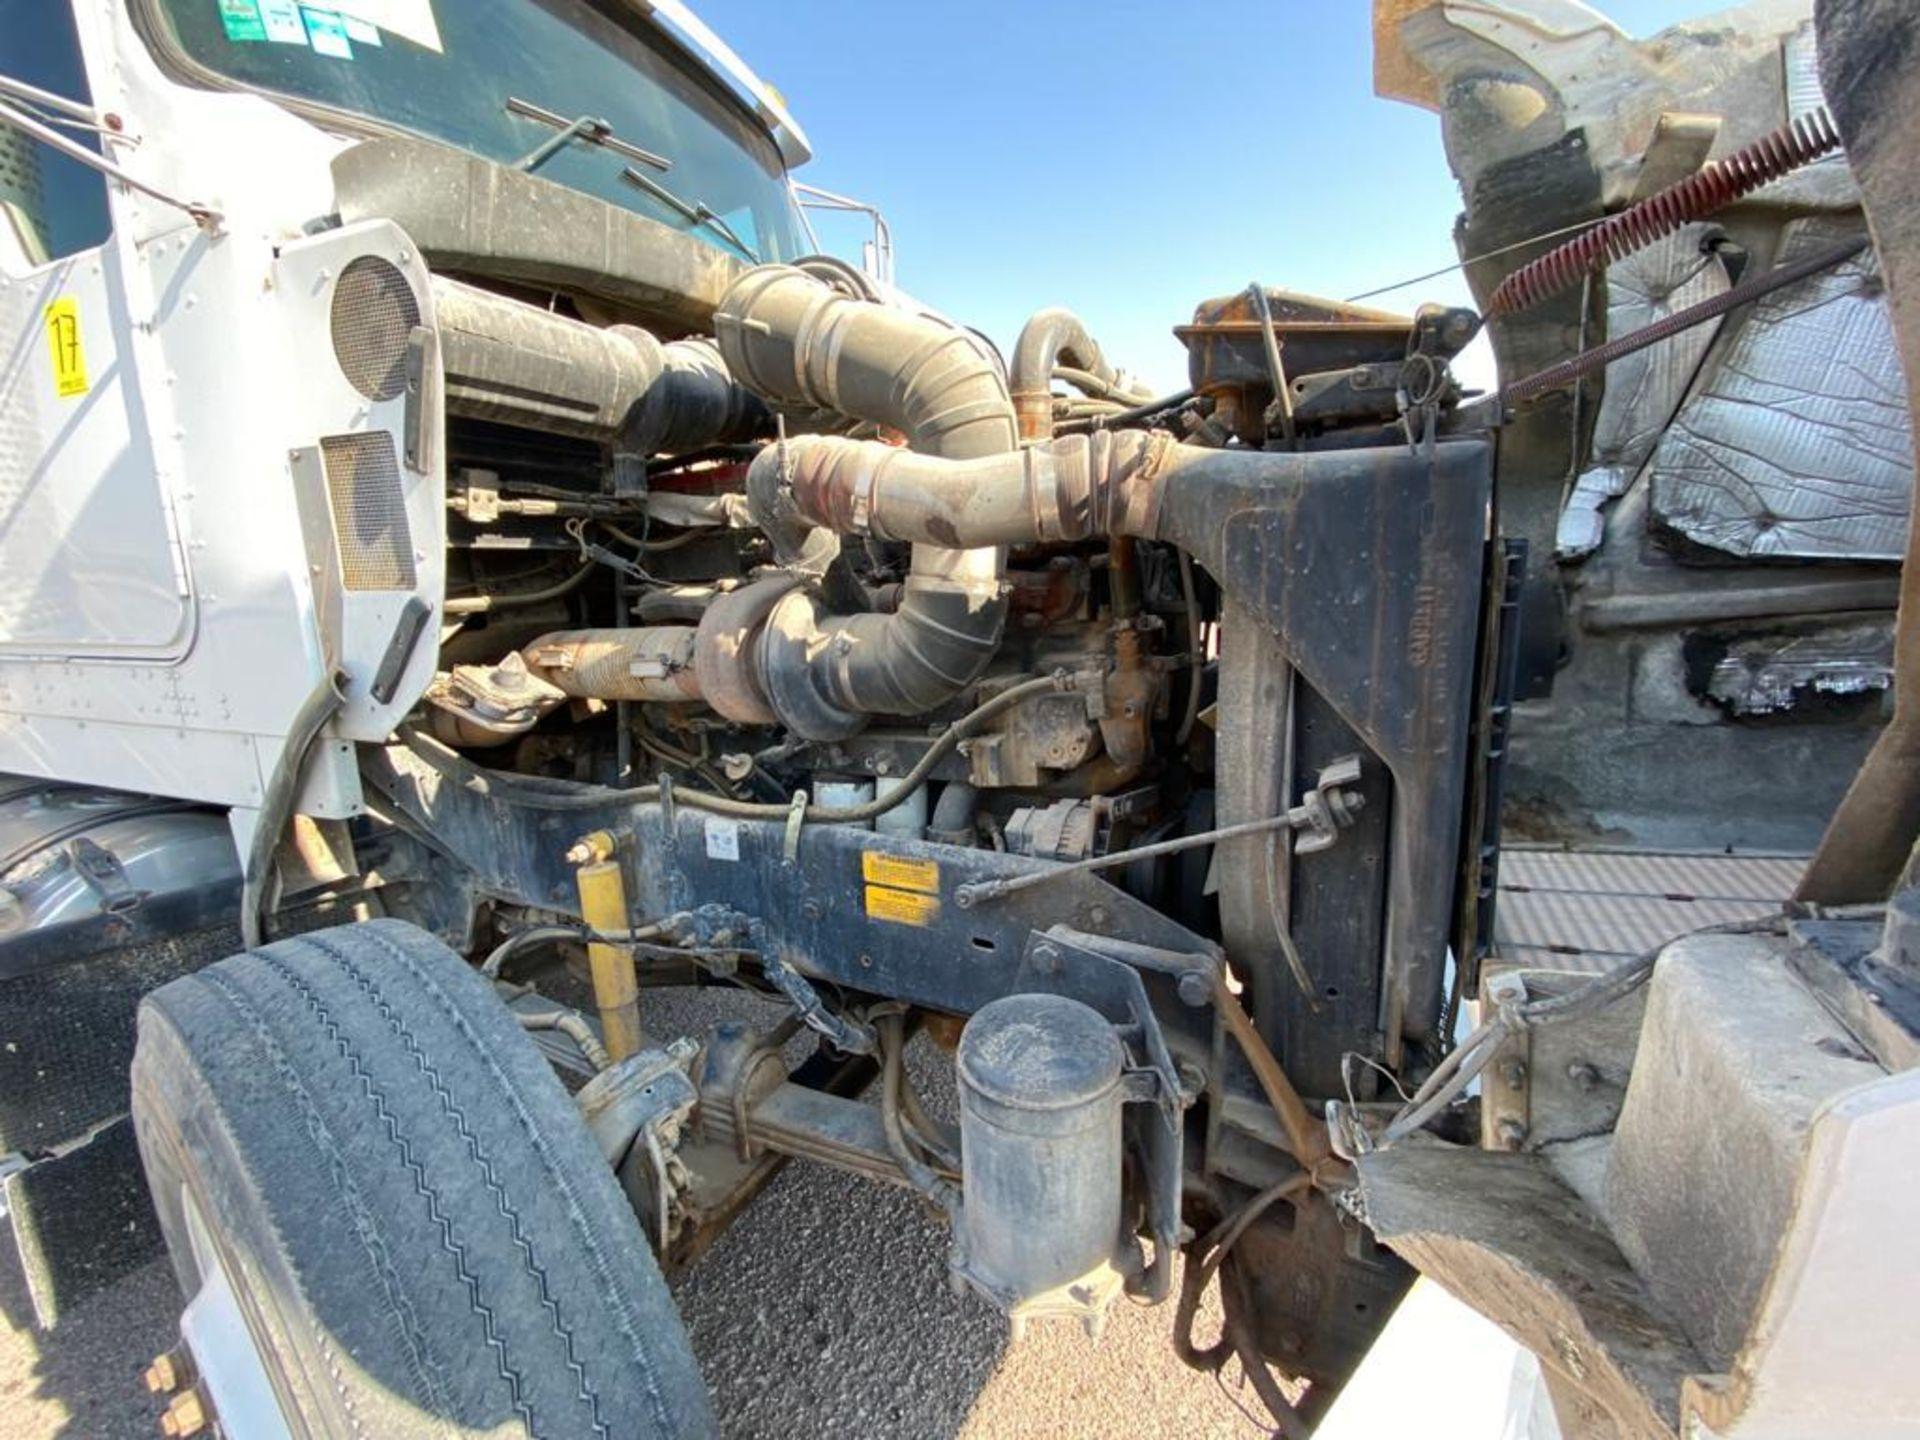 1998 Kenworth Sleeper Truck Tractor, standard transmission of 18 speeds - Image 49 of 55